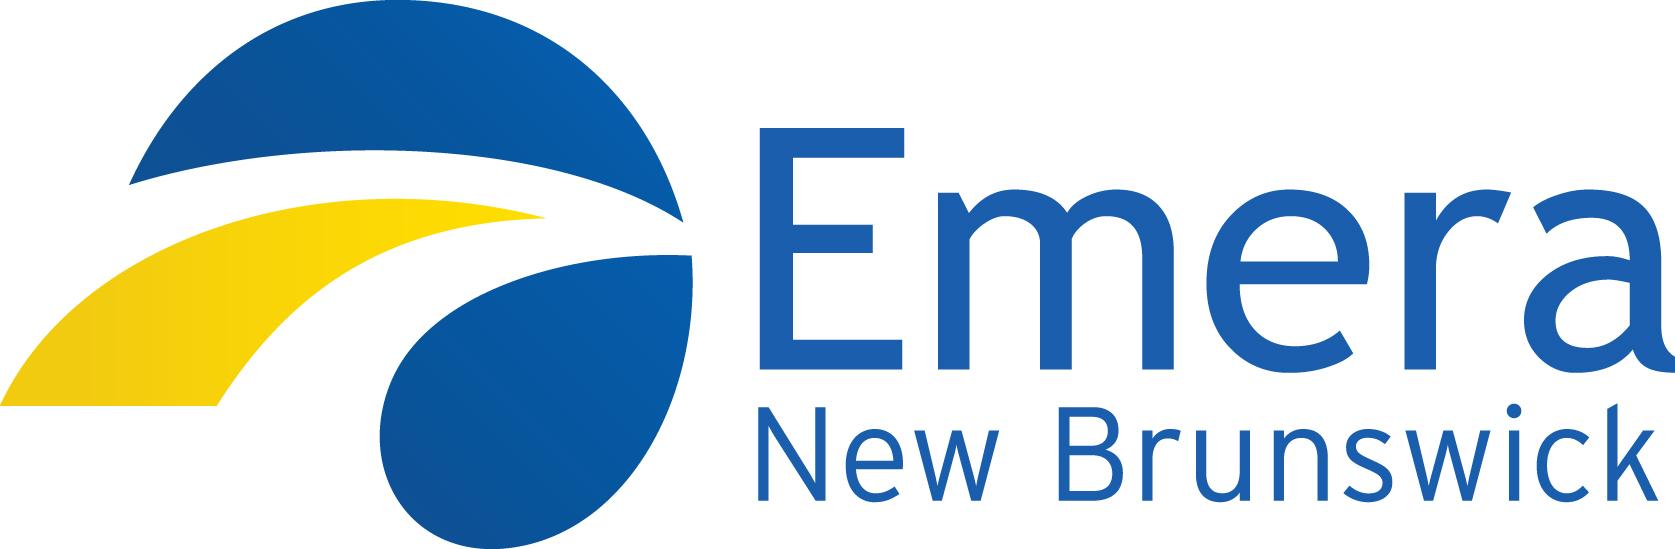 ENB colour large.jpg